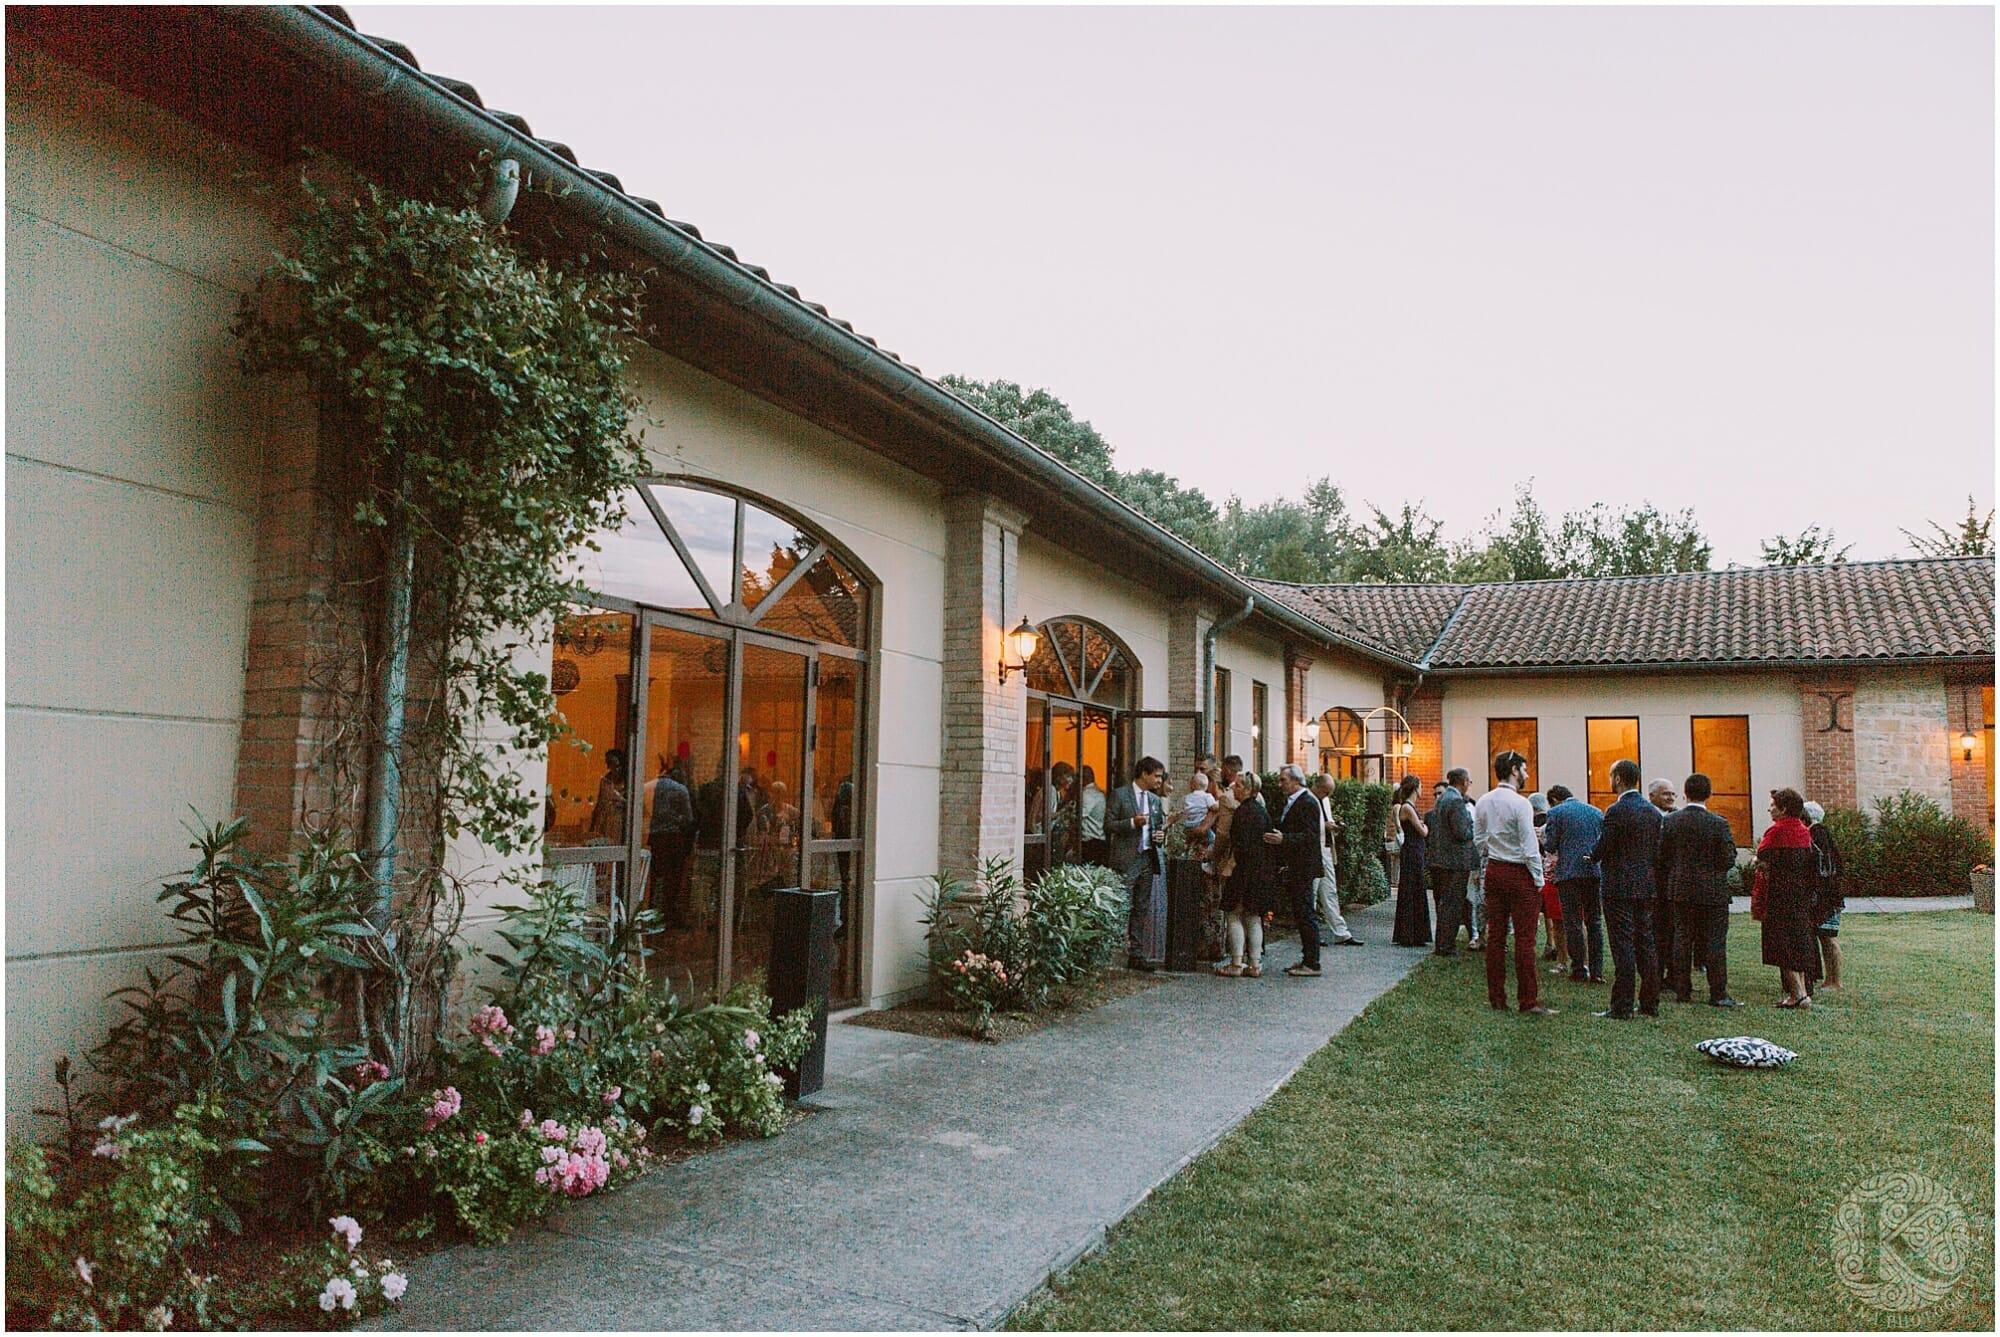 Kateryna-photos-photographe-mariage-chateau-des-3-fontaines-provence-avignon-vaucluse-sud_0112.jpg